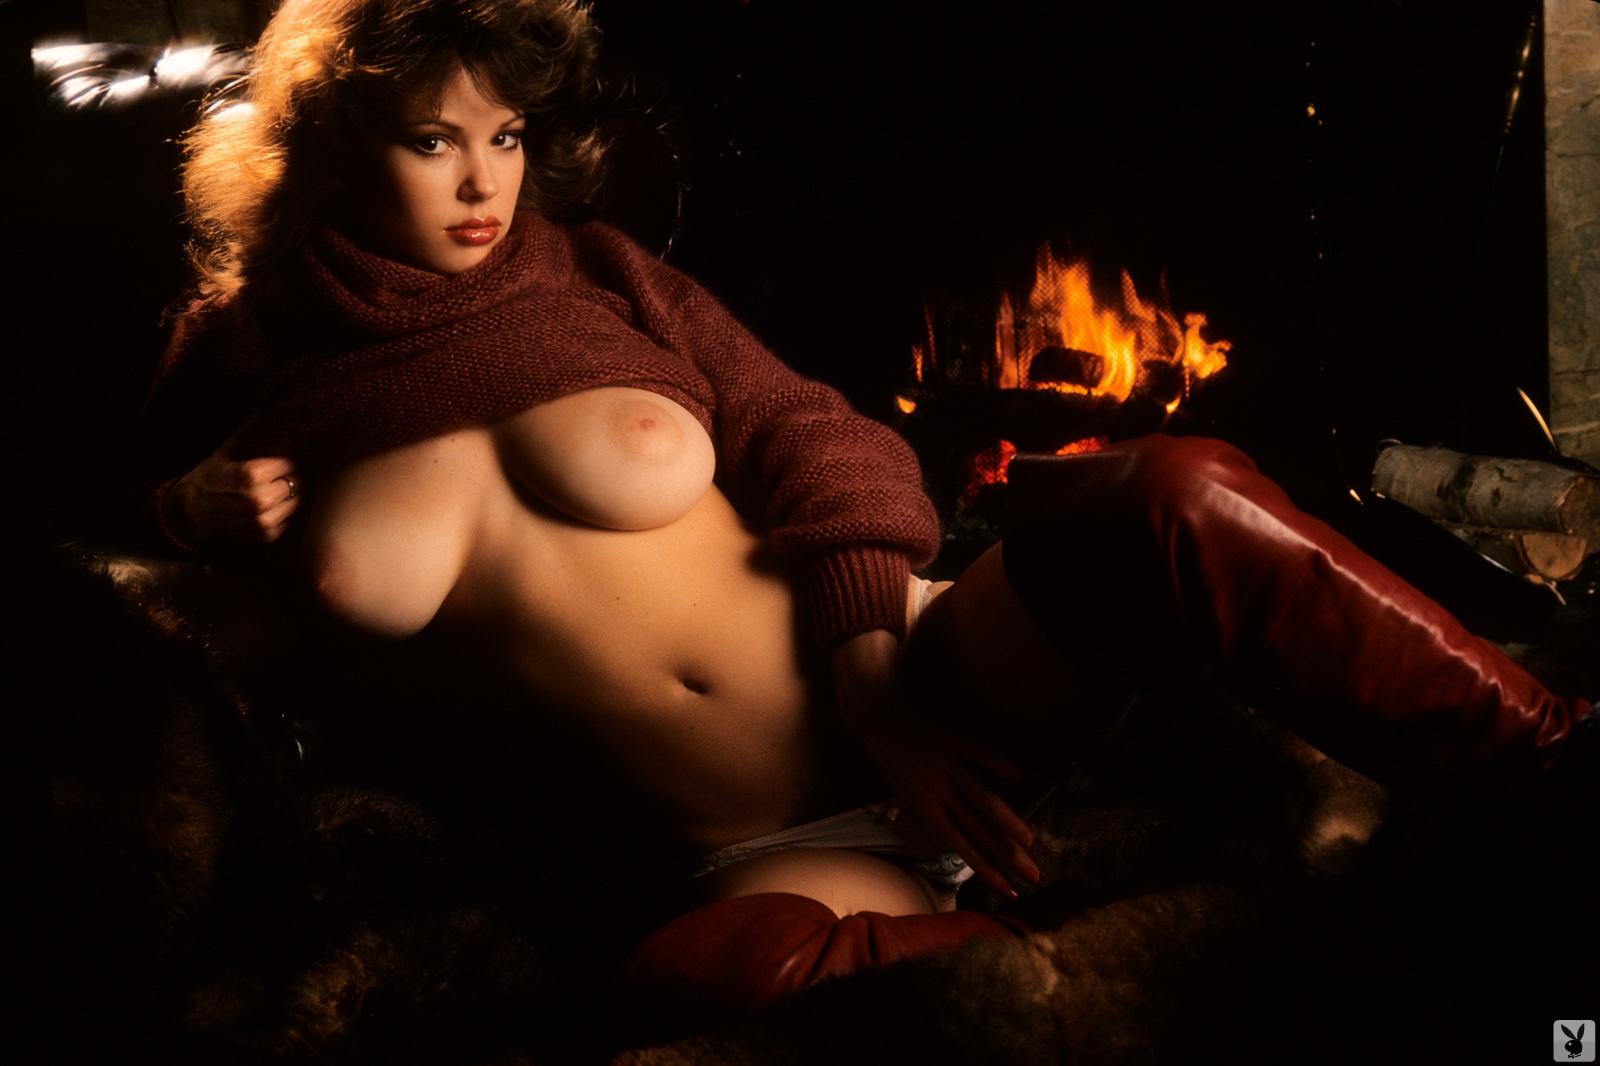 another loving look - playmates nudes   playboyplus